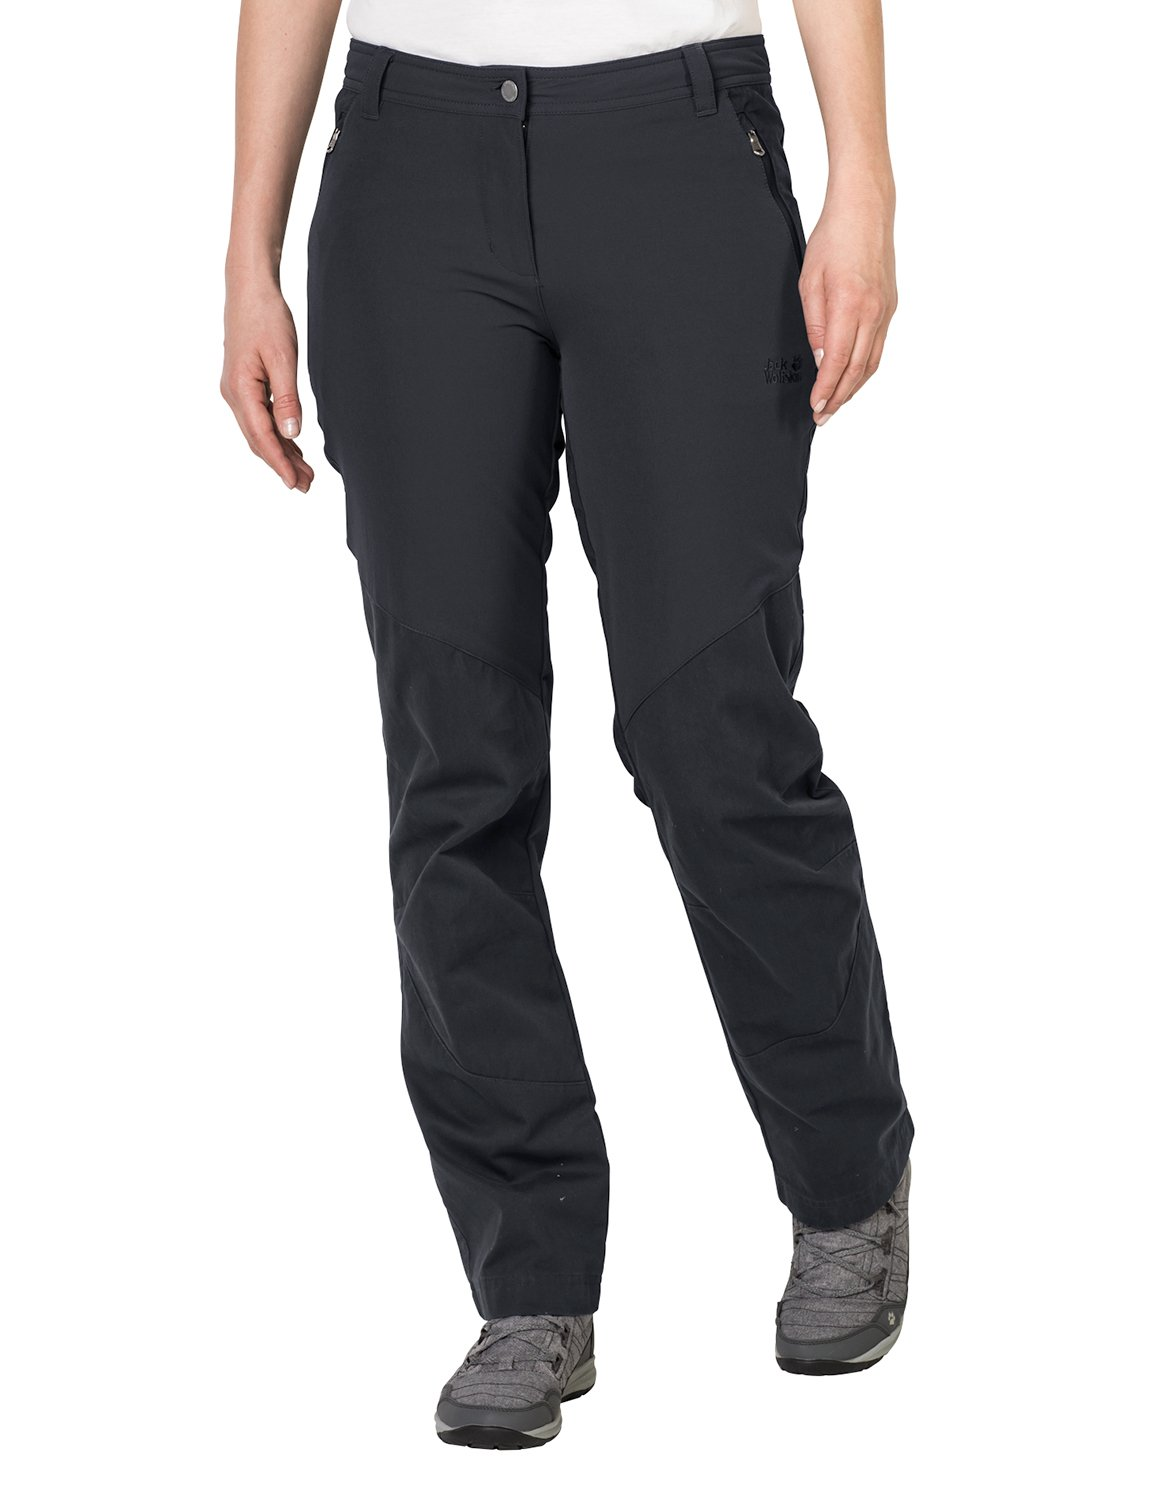 Jack Wolfskin Women's Drake Flex Pants, Phantom, 44 (US 34/32)